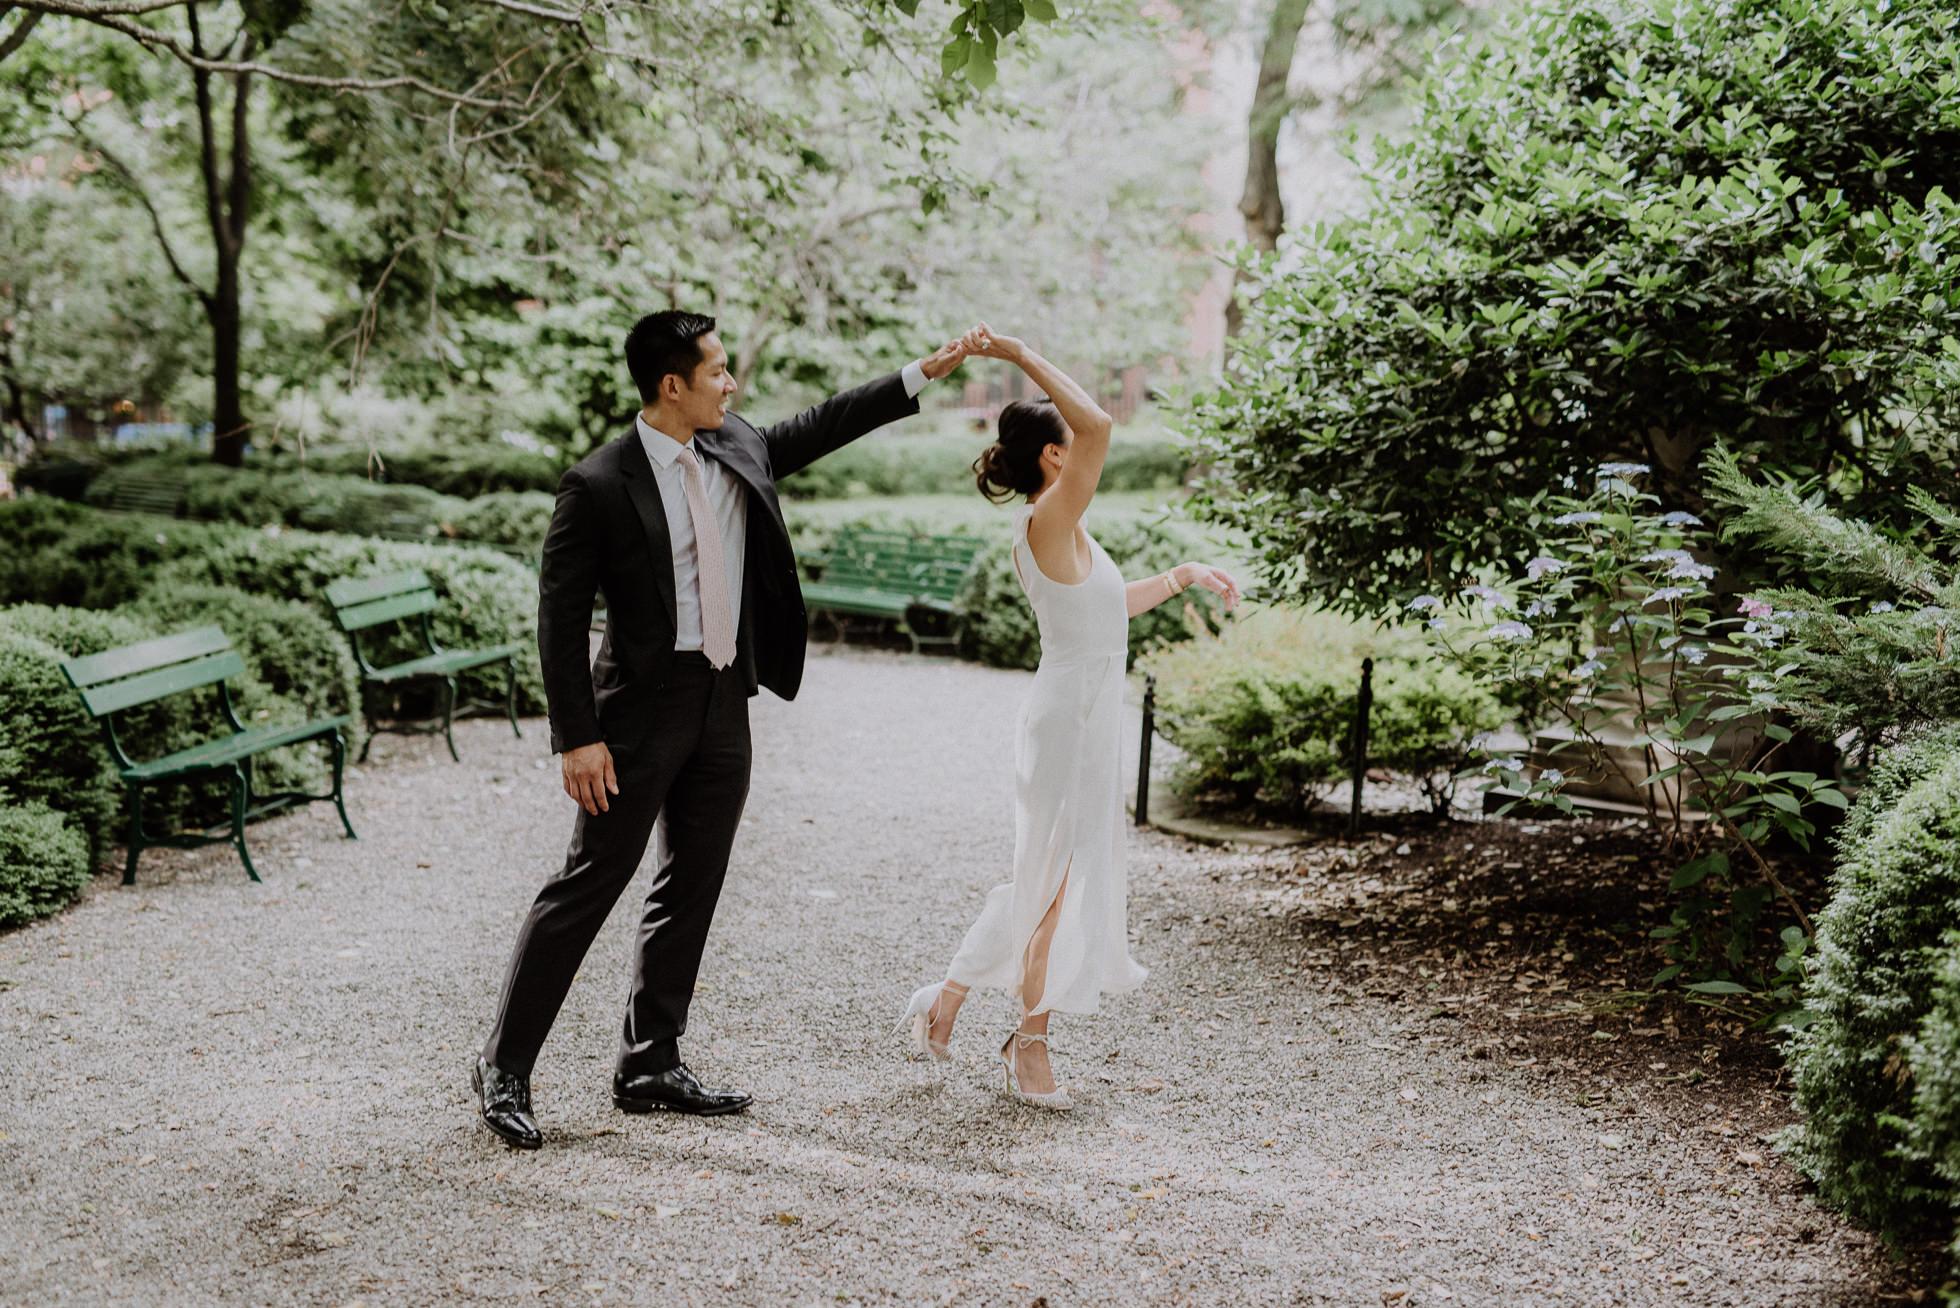 Gramercy Park wedding ceremony